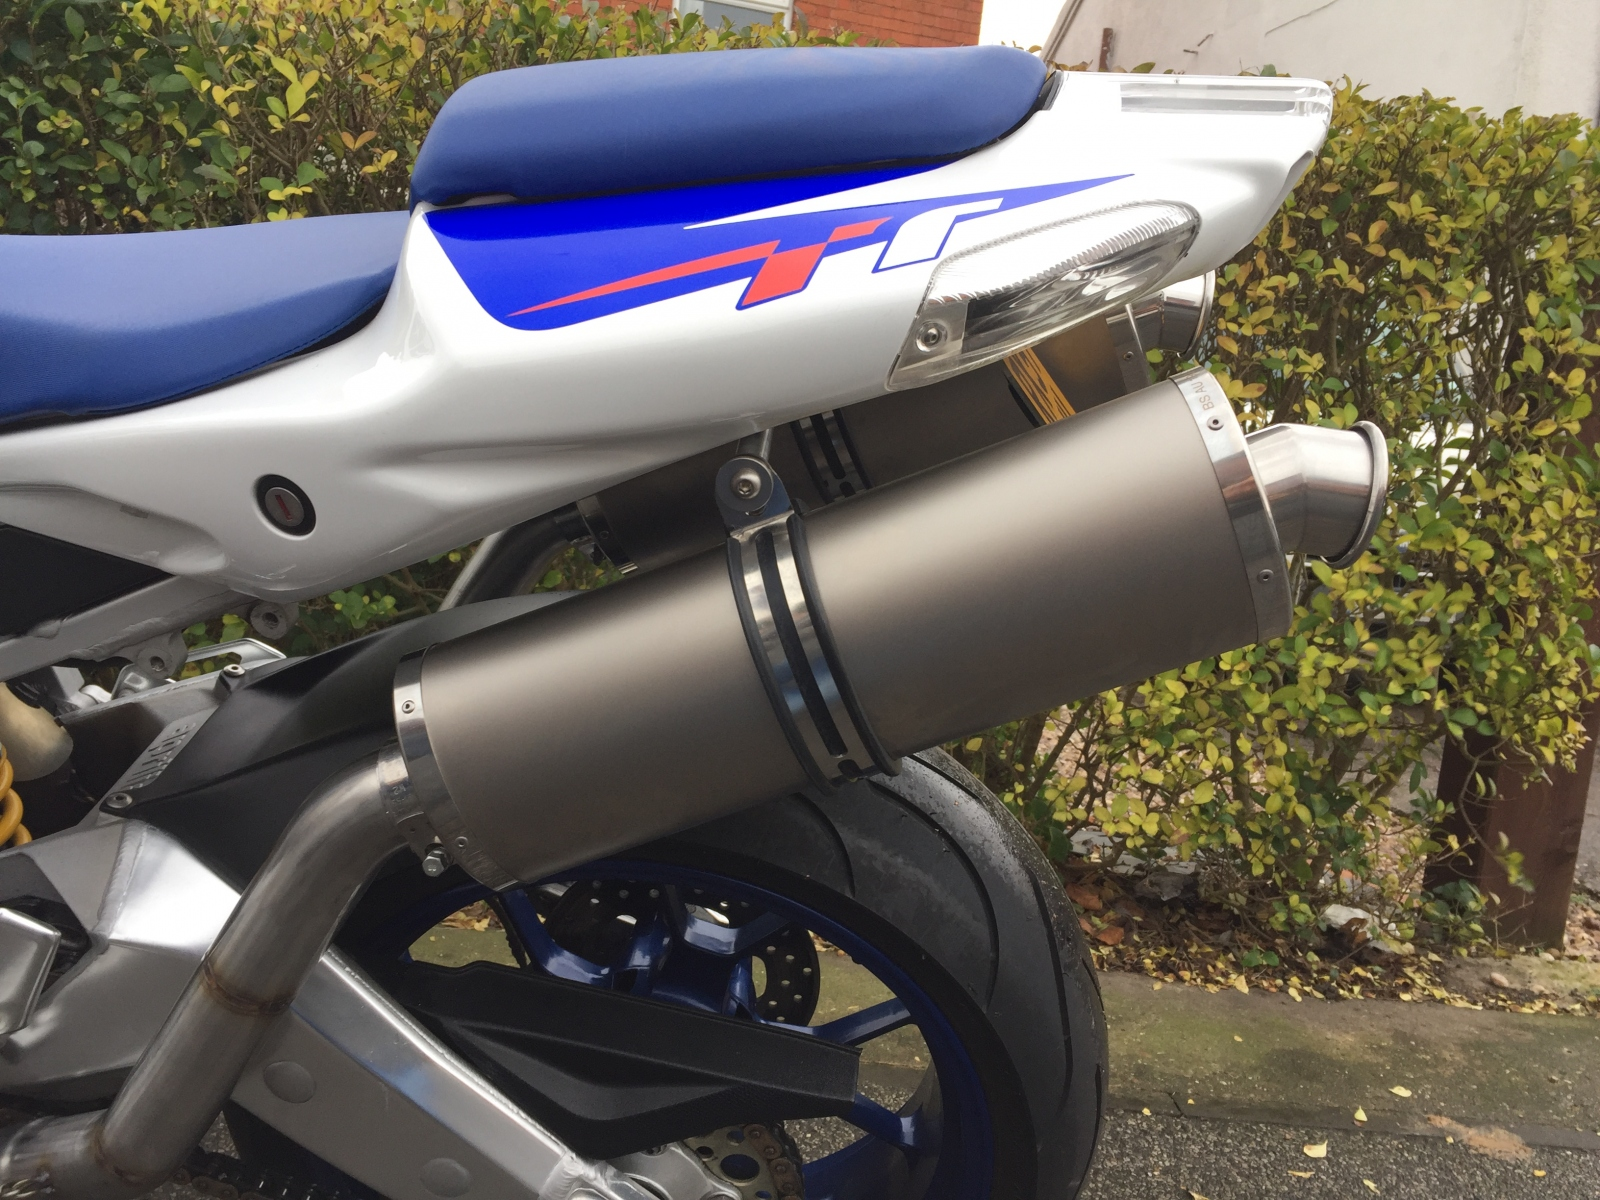 "Aprilia Tuono 1998-2004 <p>A16 Road Legal or Race Plain Titanium Exhausts with Traditional Spouts</p><br/><br/><a href=""https://a16roadnracesupplies.co.uk/product/a16-aprilia-exhausts/"">Buy now!</a>"